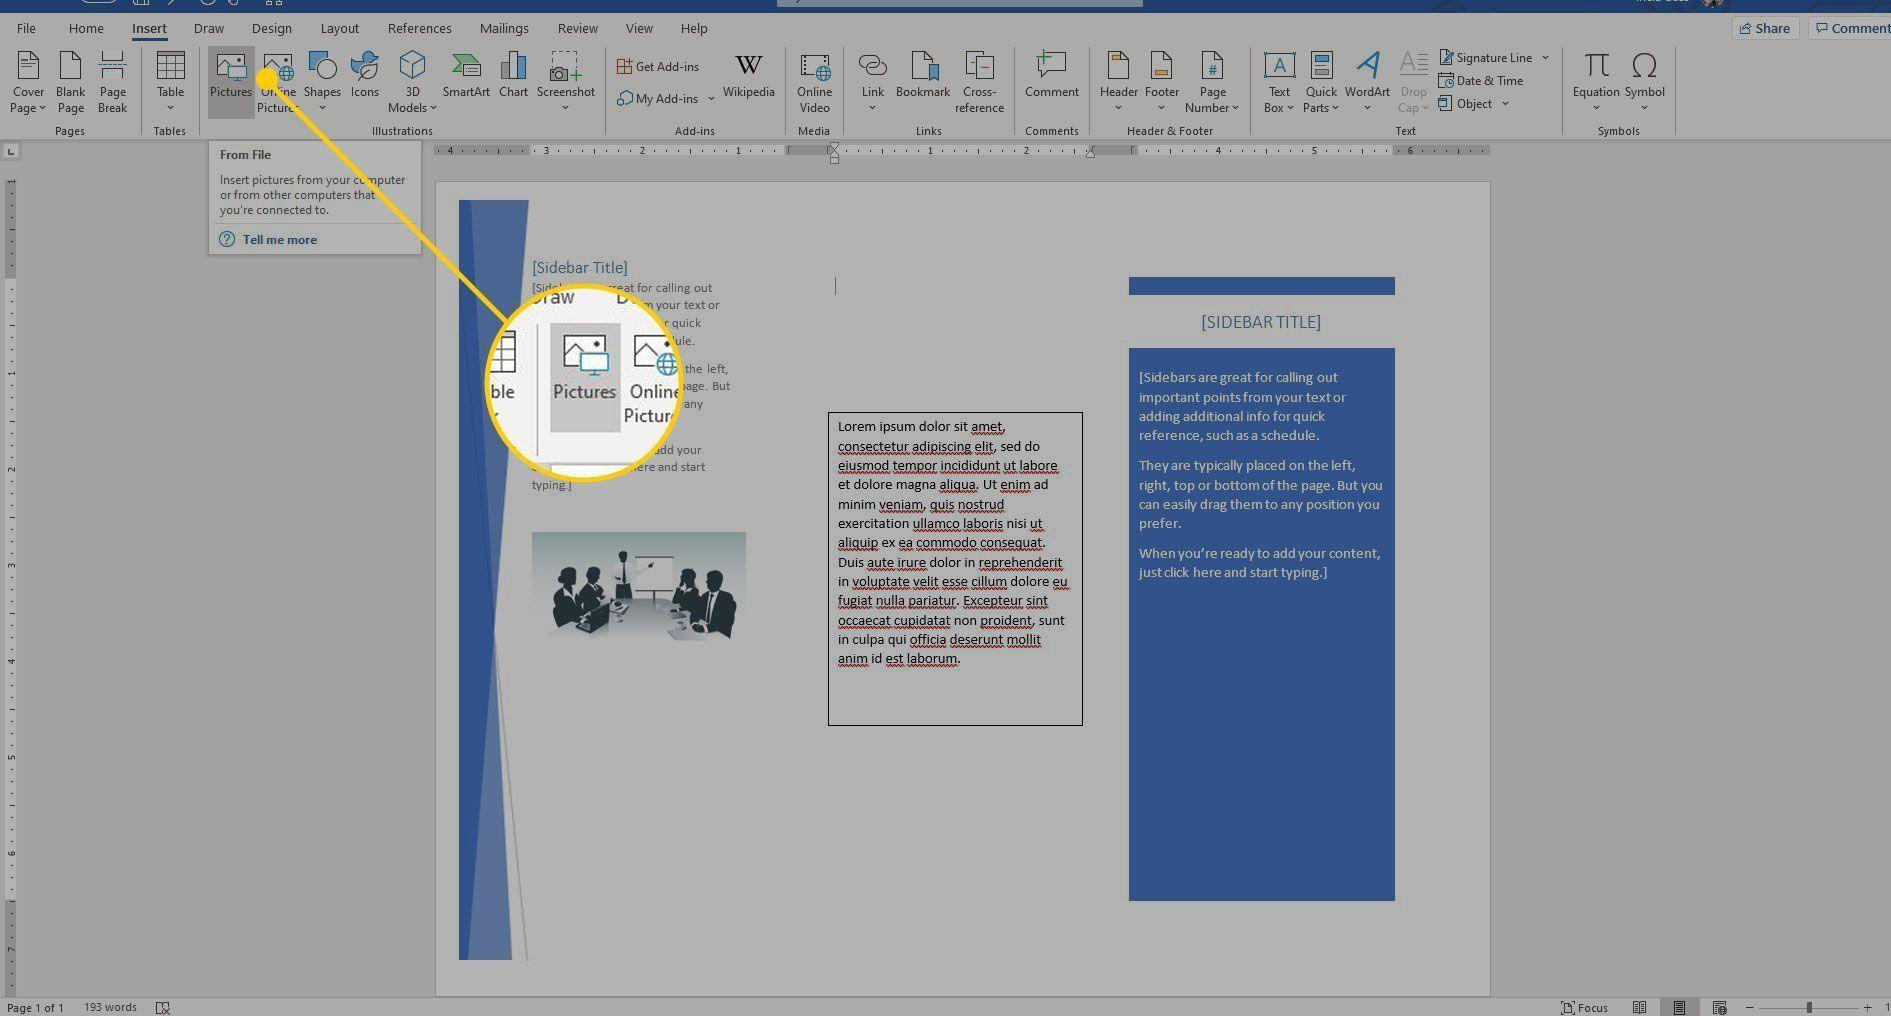 001 Singular Format Brochure Word 2007 Image Full